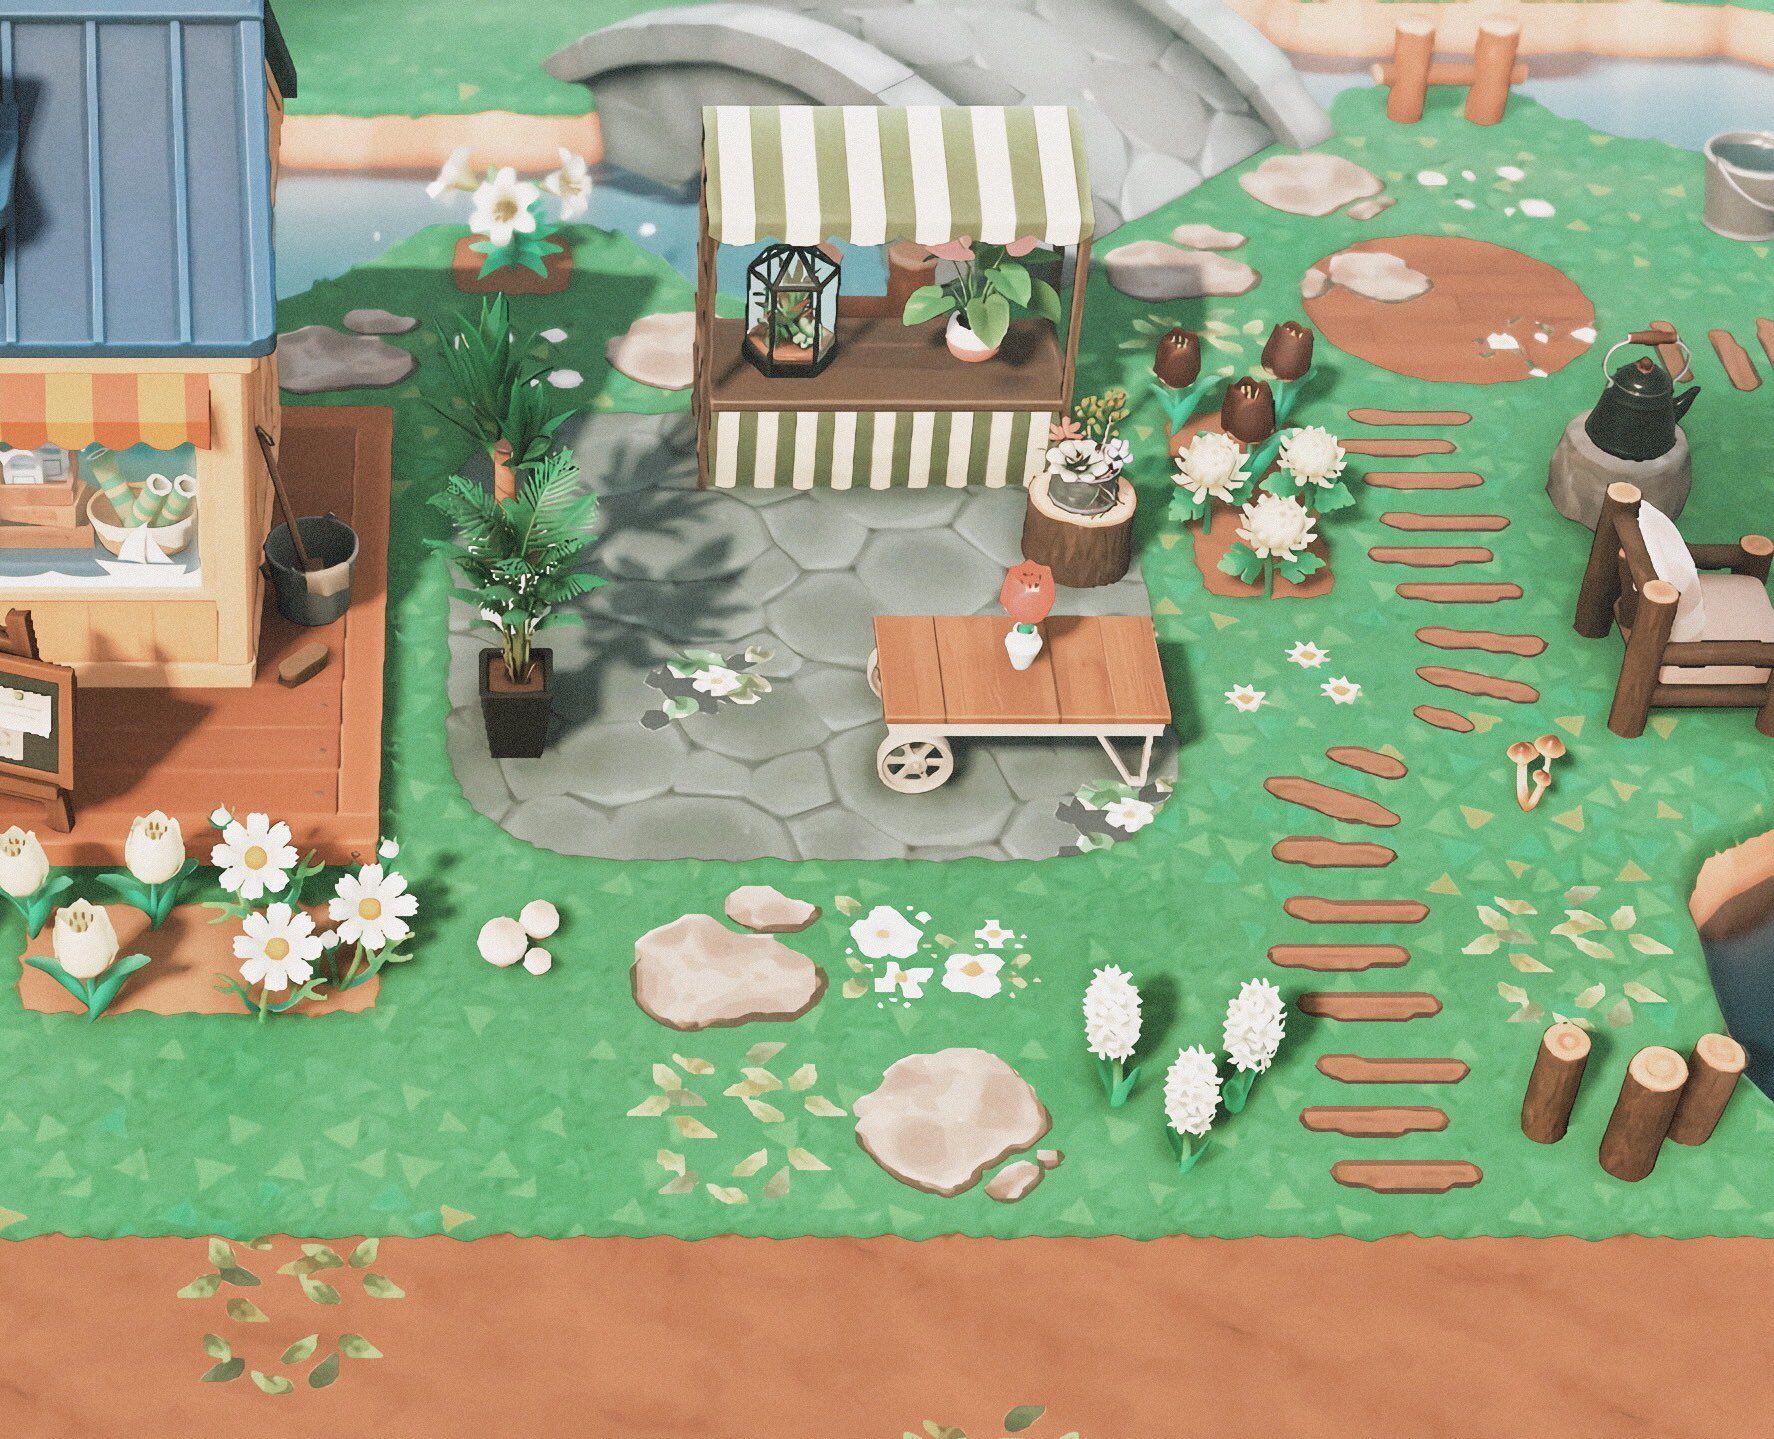 Jo On Twitter Animal Crossing Qr New Animal Crossing Animal Crossing